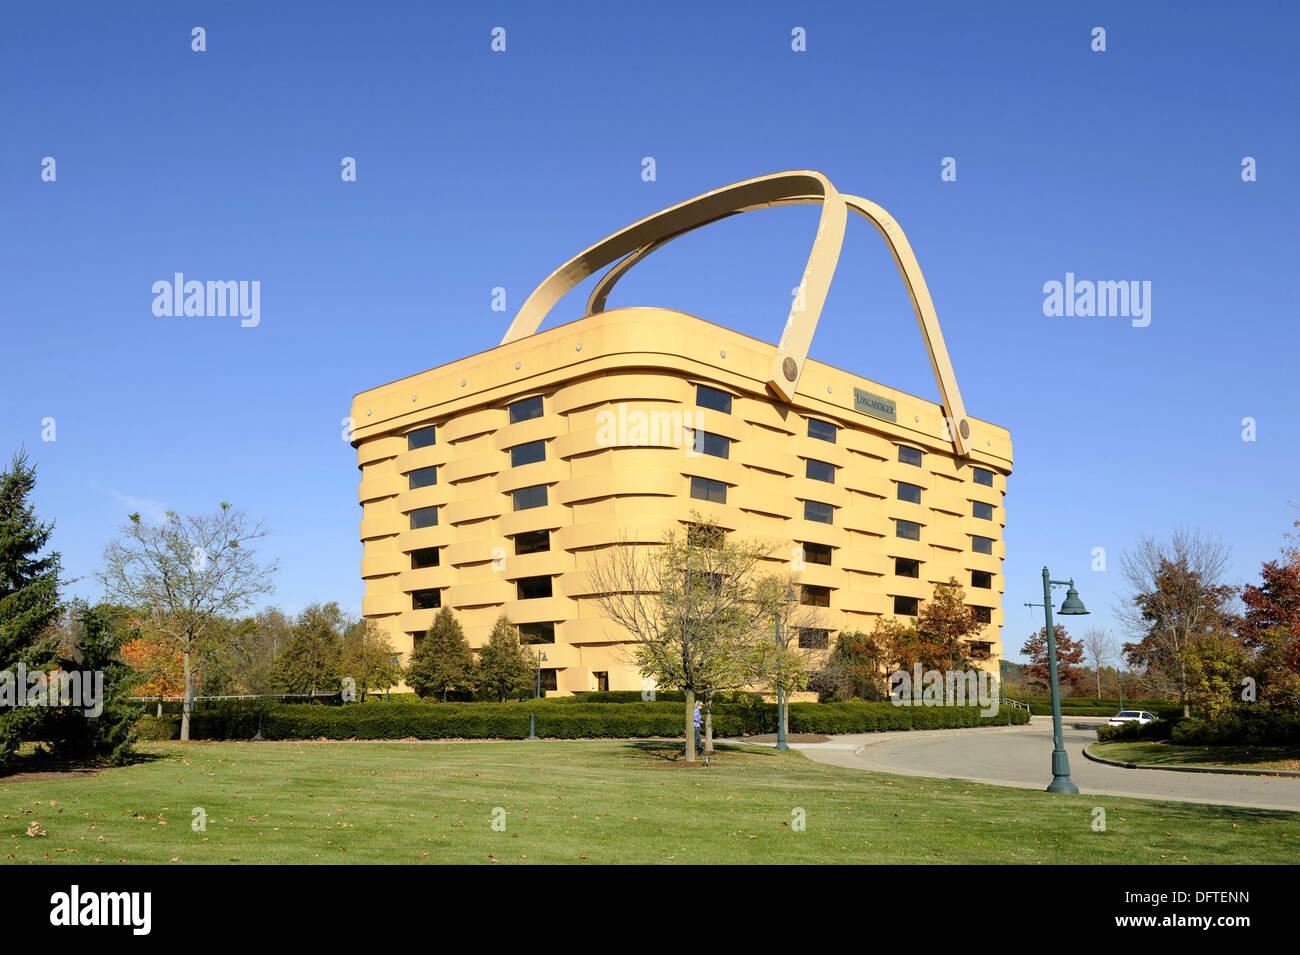 Superieur Longaberger´s Home Office Zanesville Ohio U S Seven Story Building Basket    Stock Image